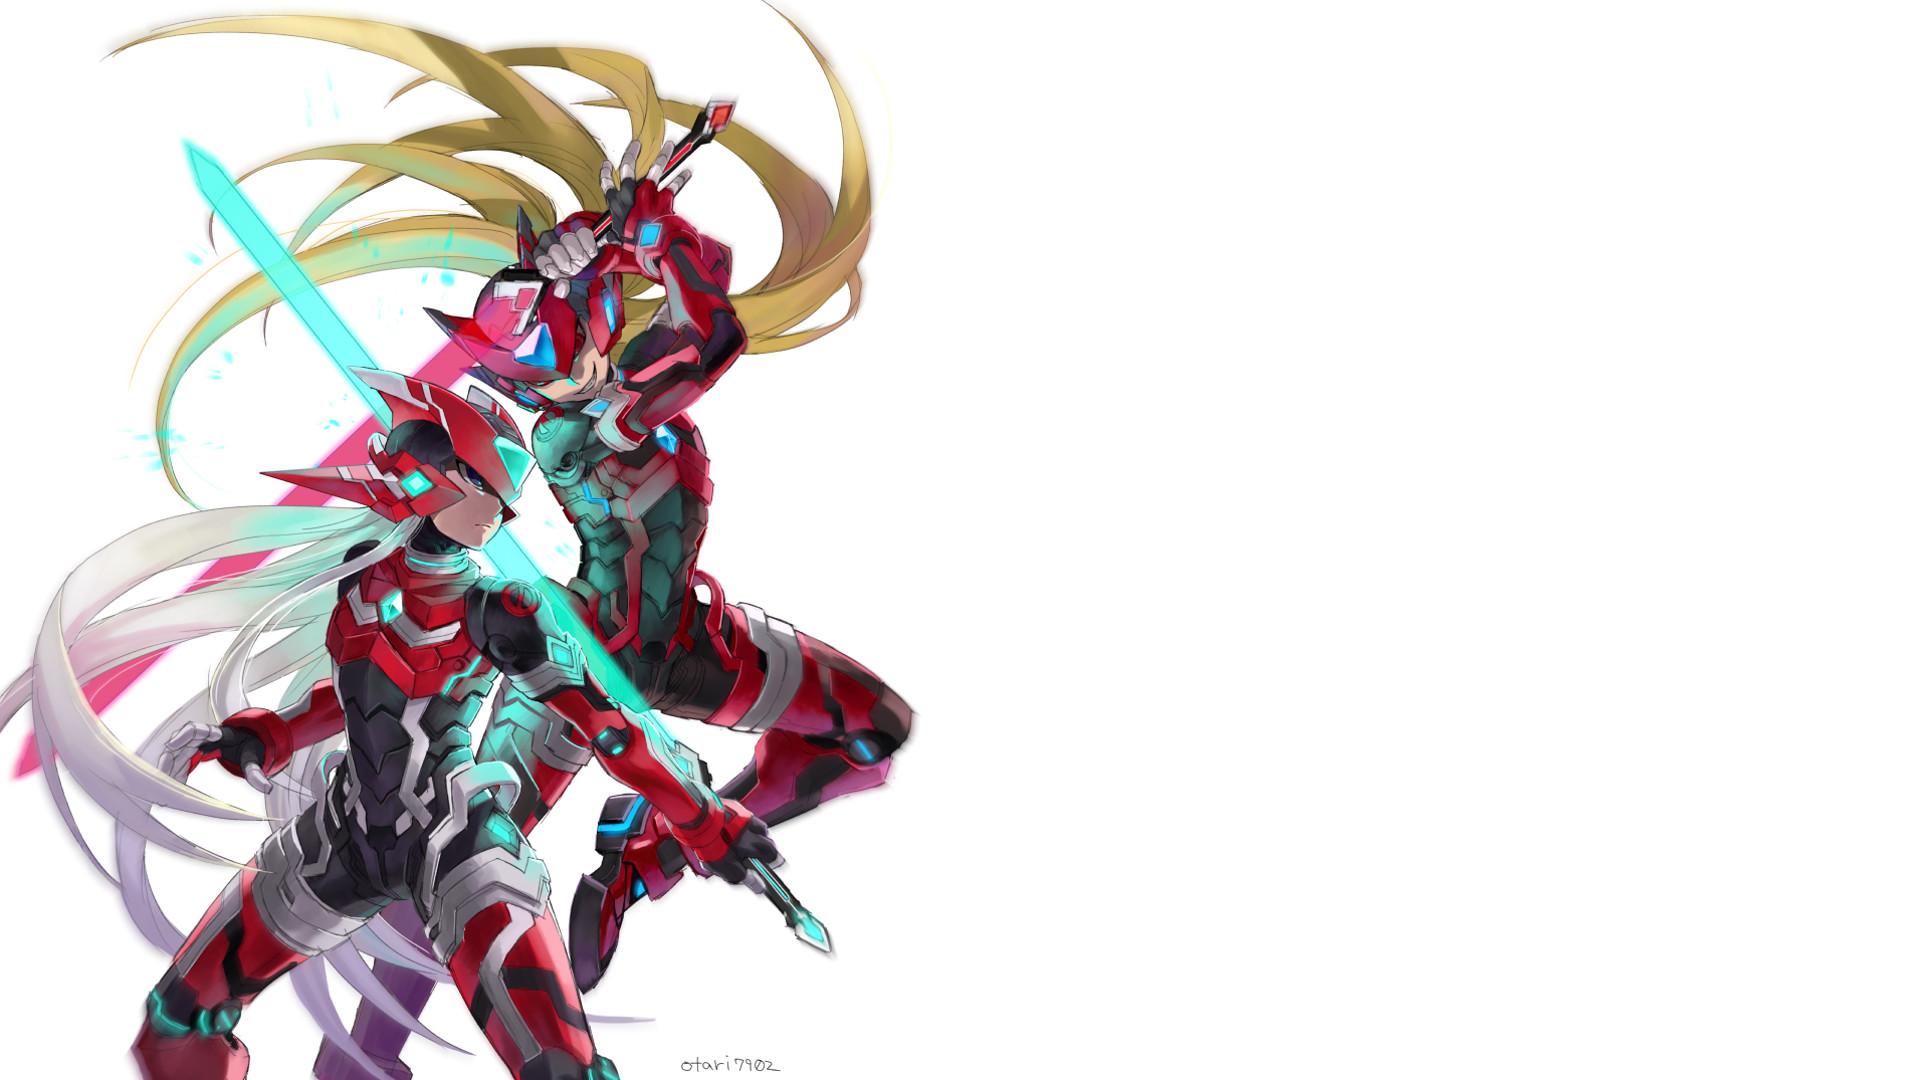 Megaman Zero Wallpaper Android